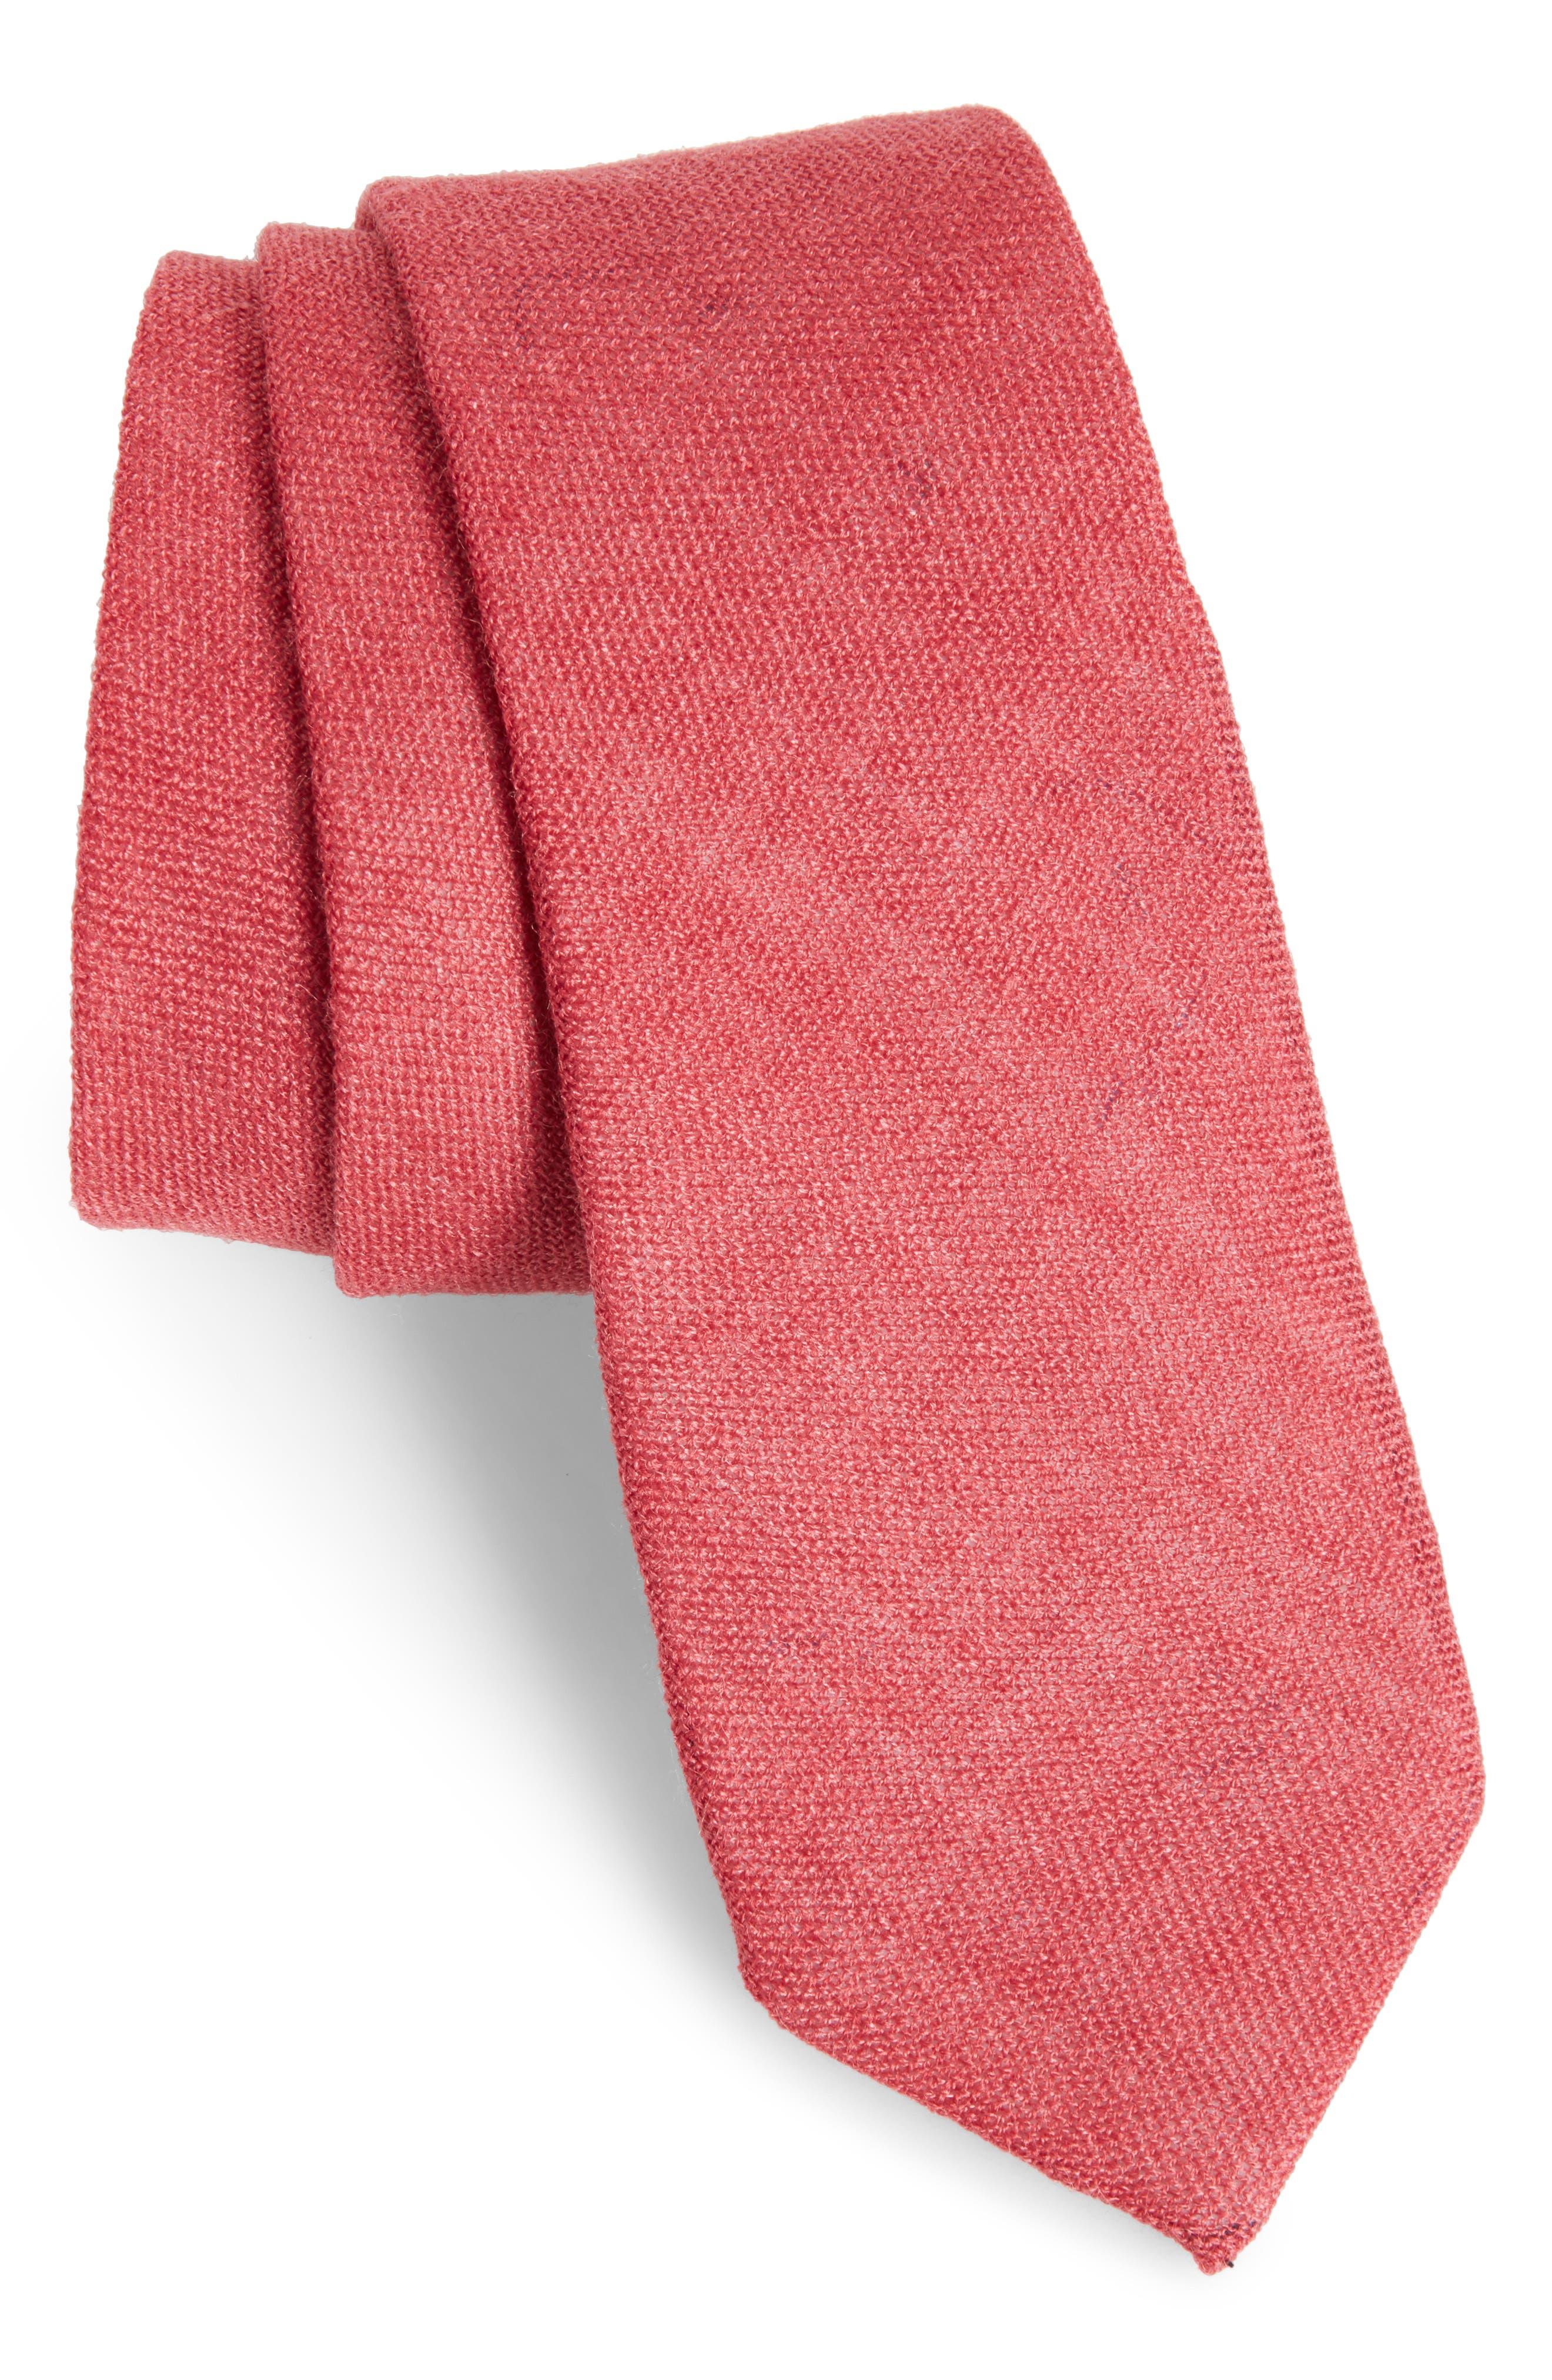 Main Image - Nordstrom Men's Shop Bradford Solid Cotton Skinny Tie